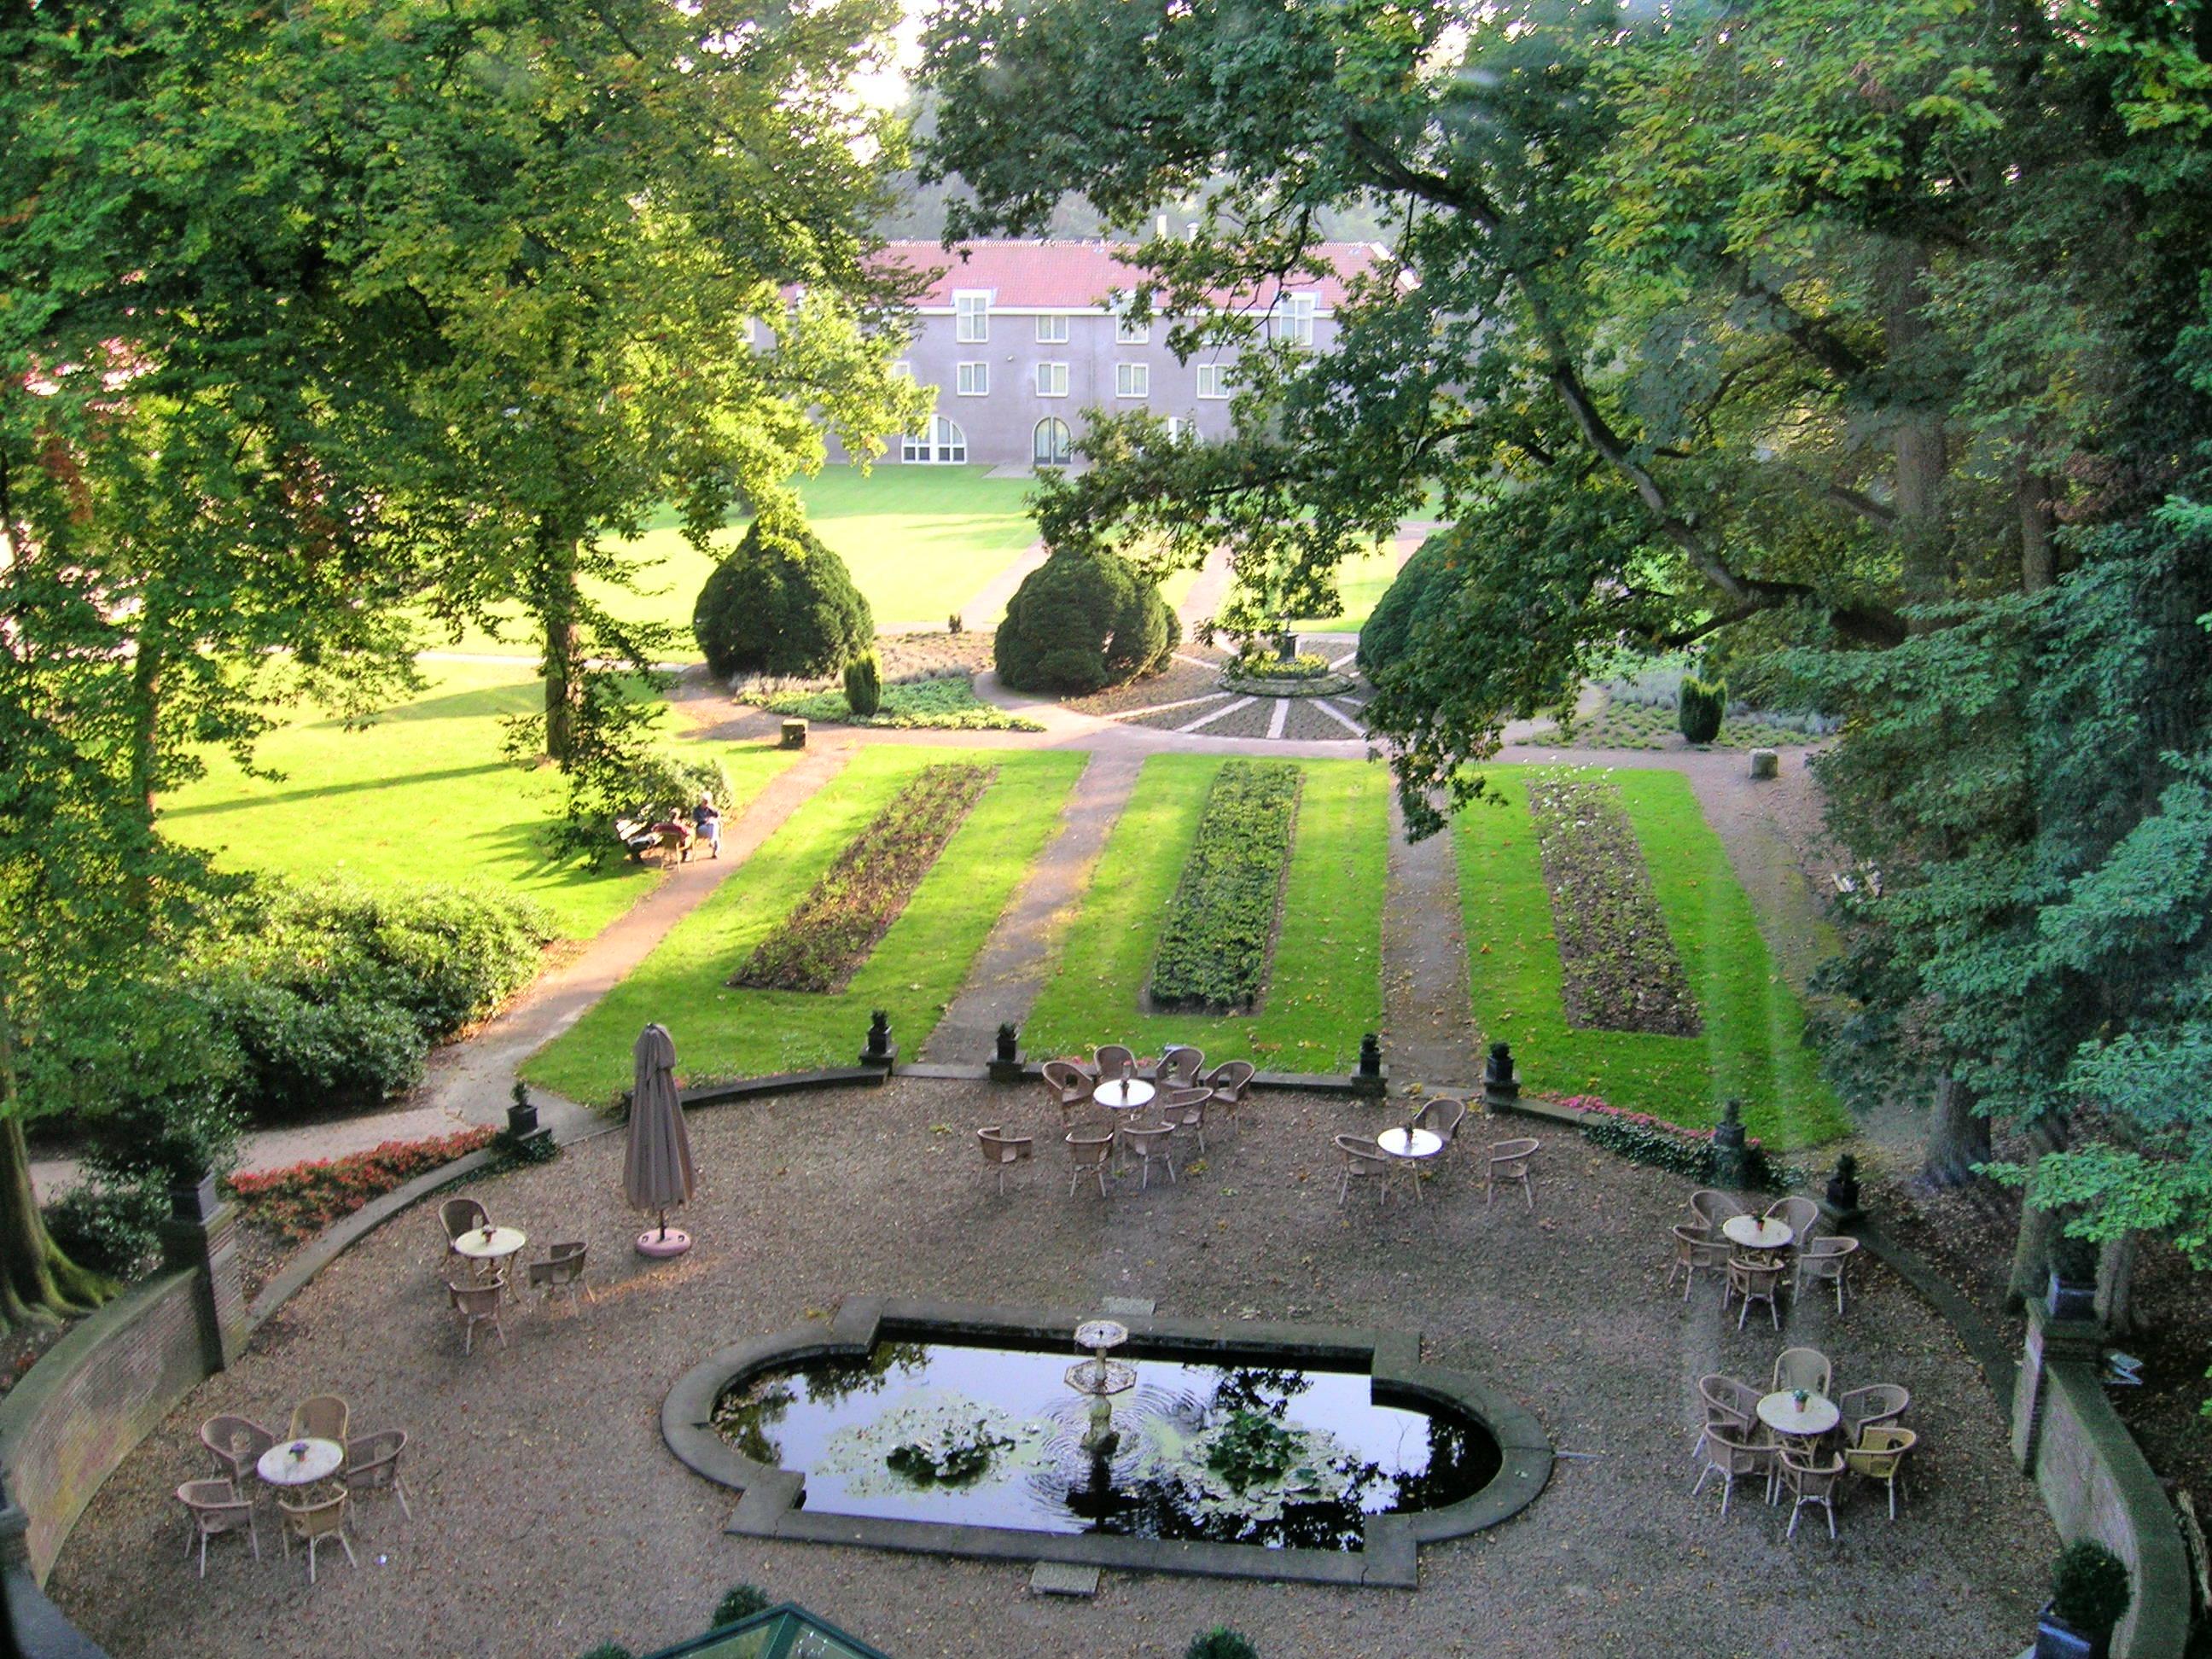 Parktuin van Hotel Landgoed Ehzerwold in Almen